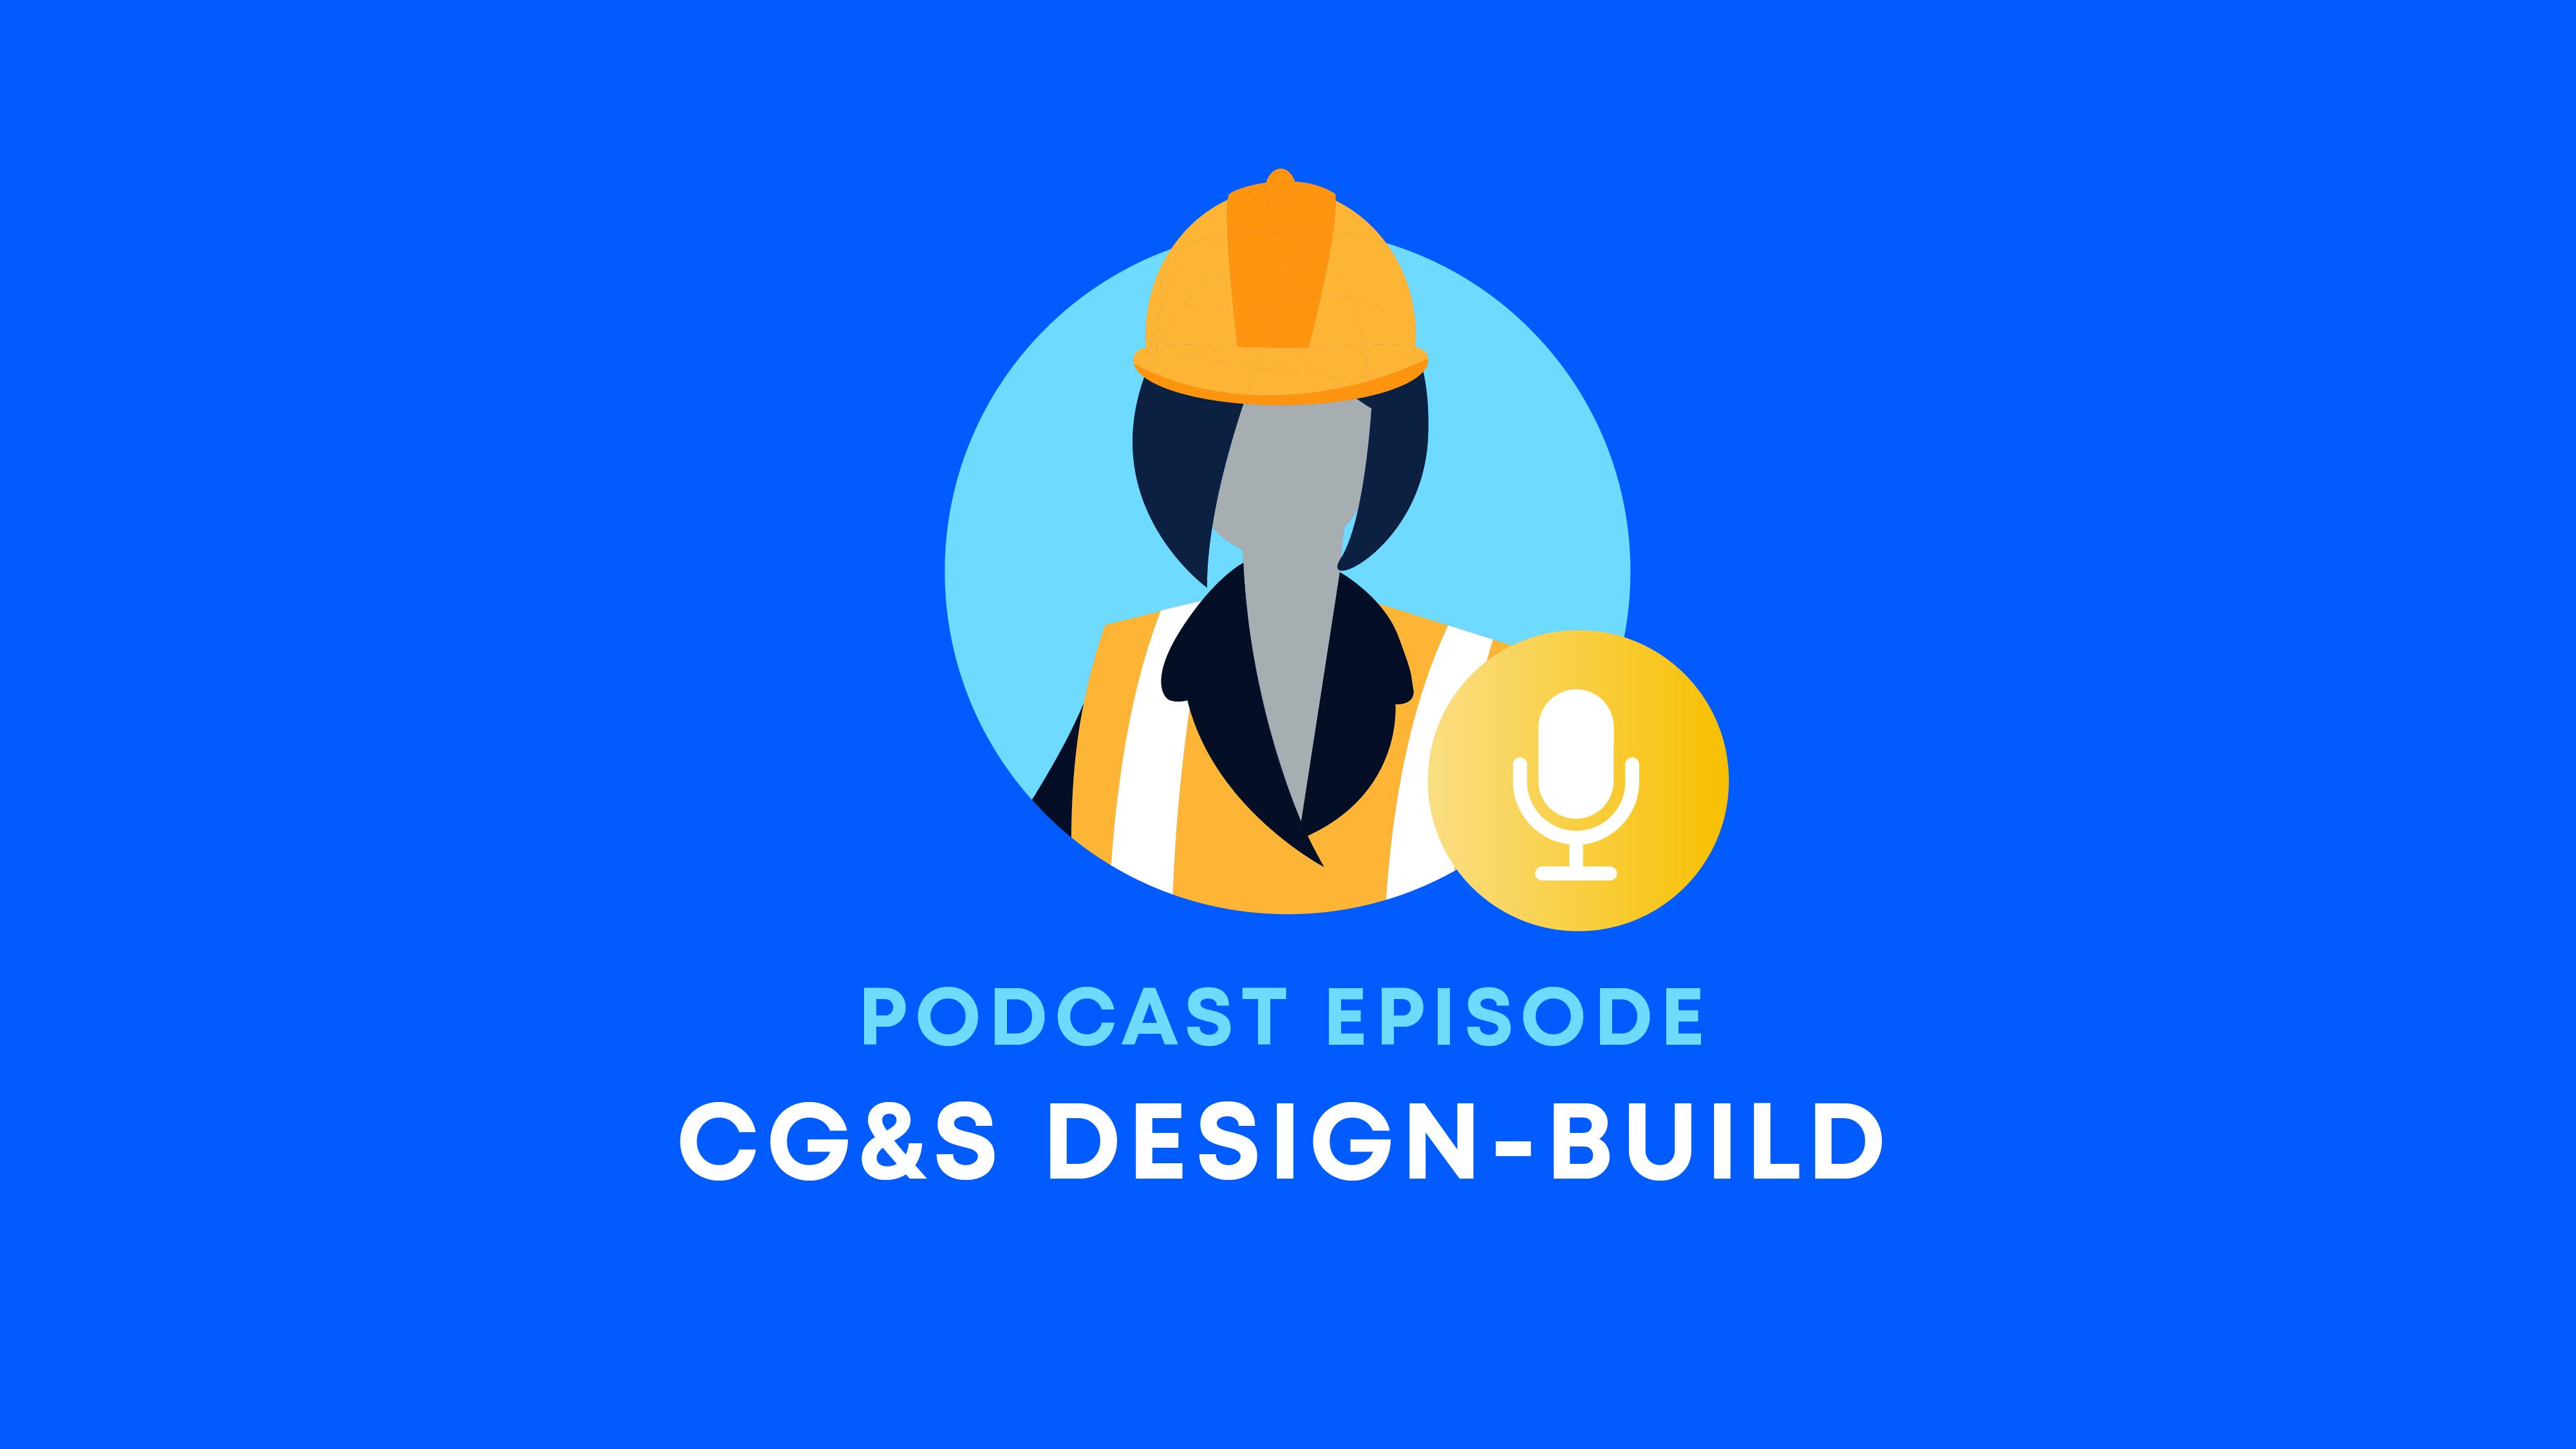 Illustration of Dolores Davis from CG&S Design-Build.